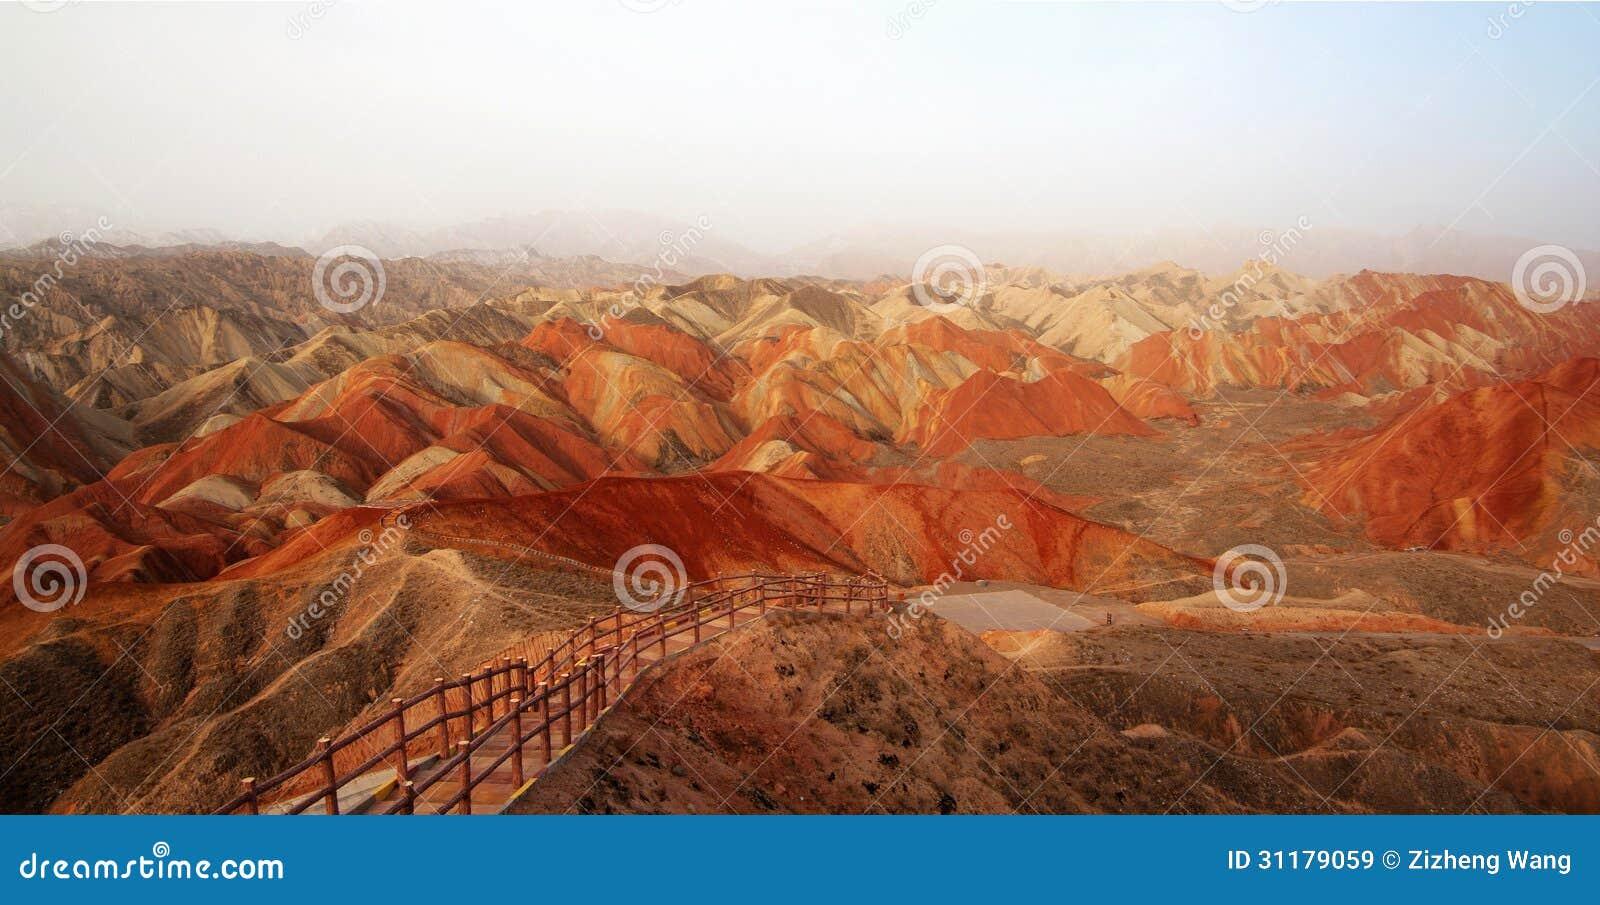 Danxia landform w Zhangye, Gansu Chiny